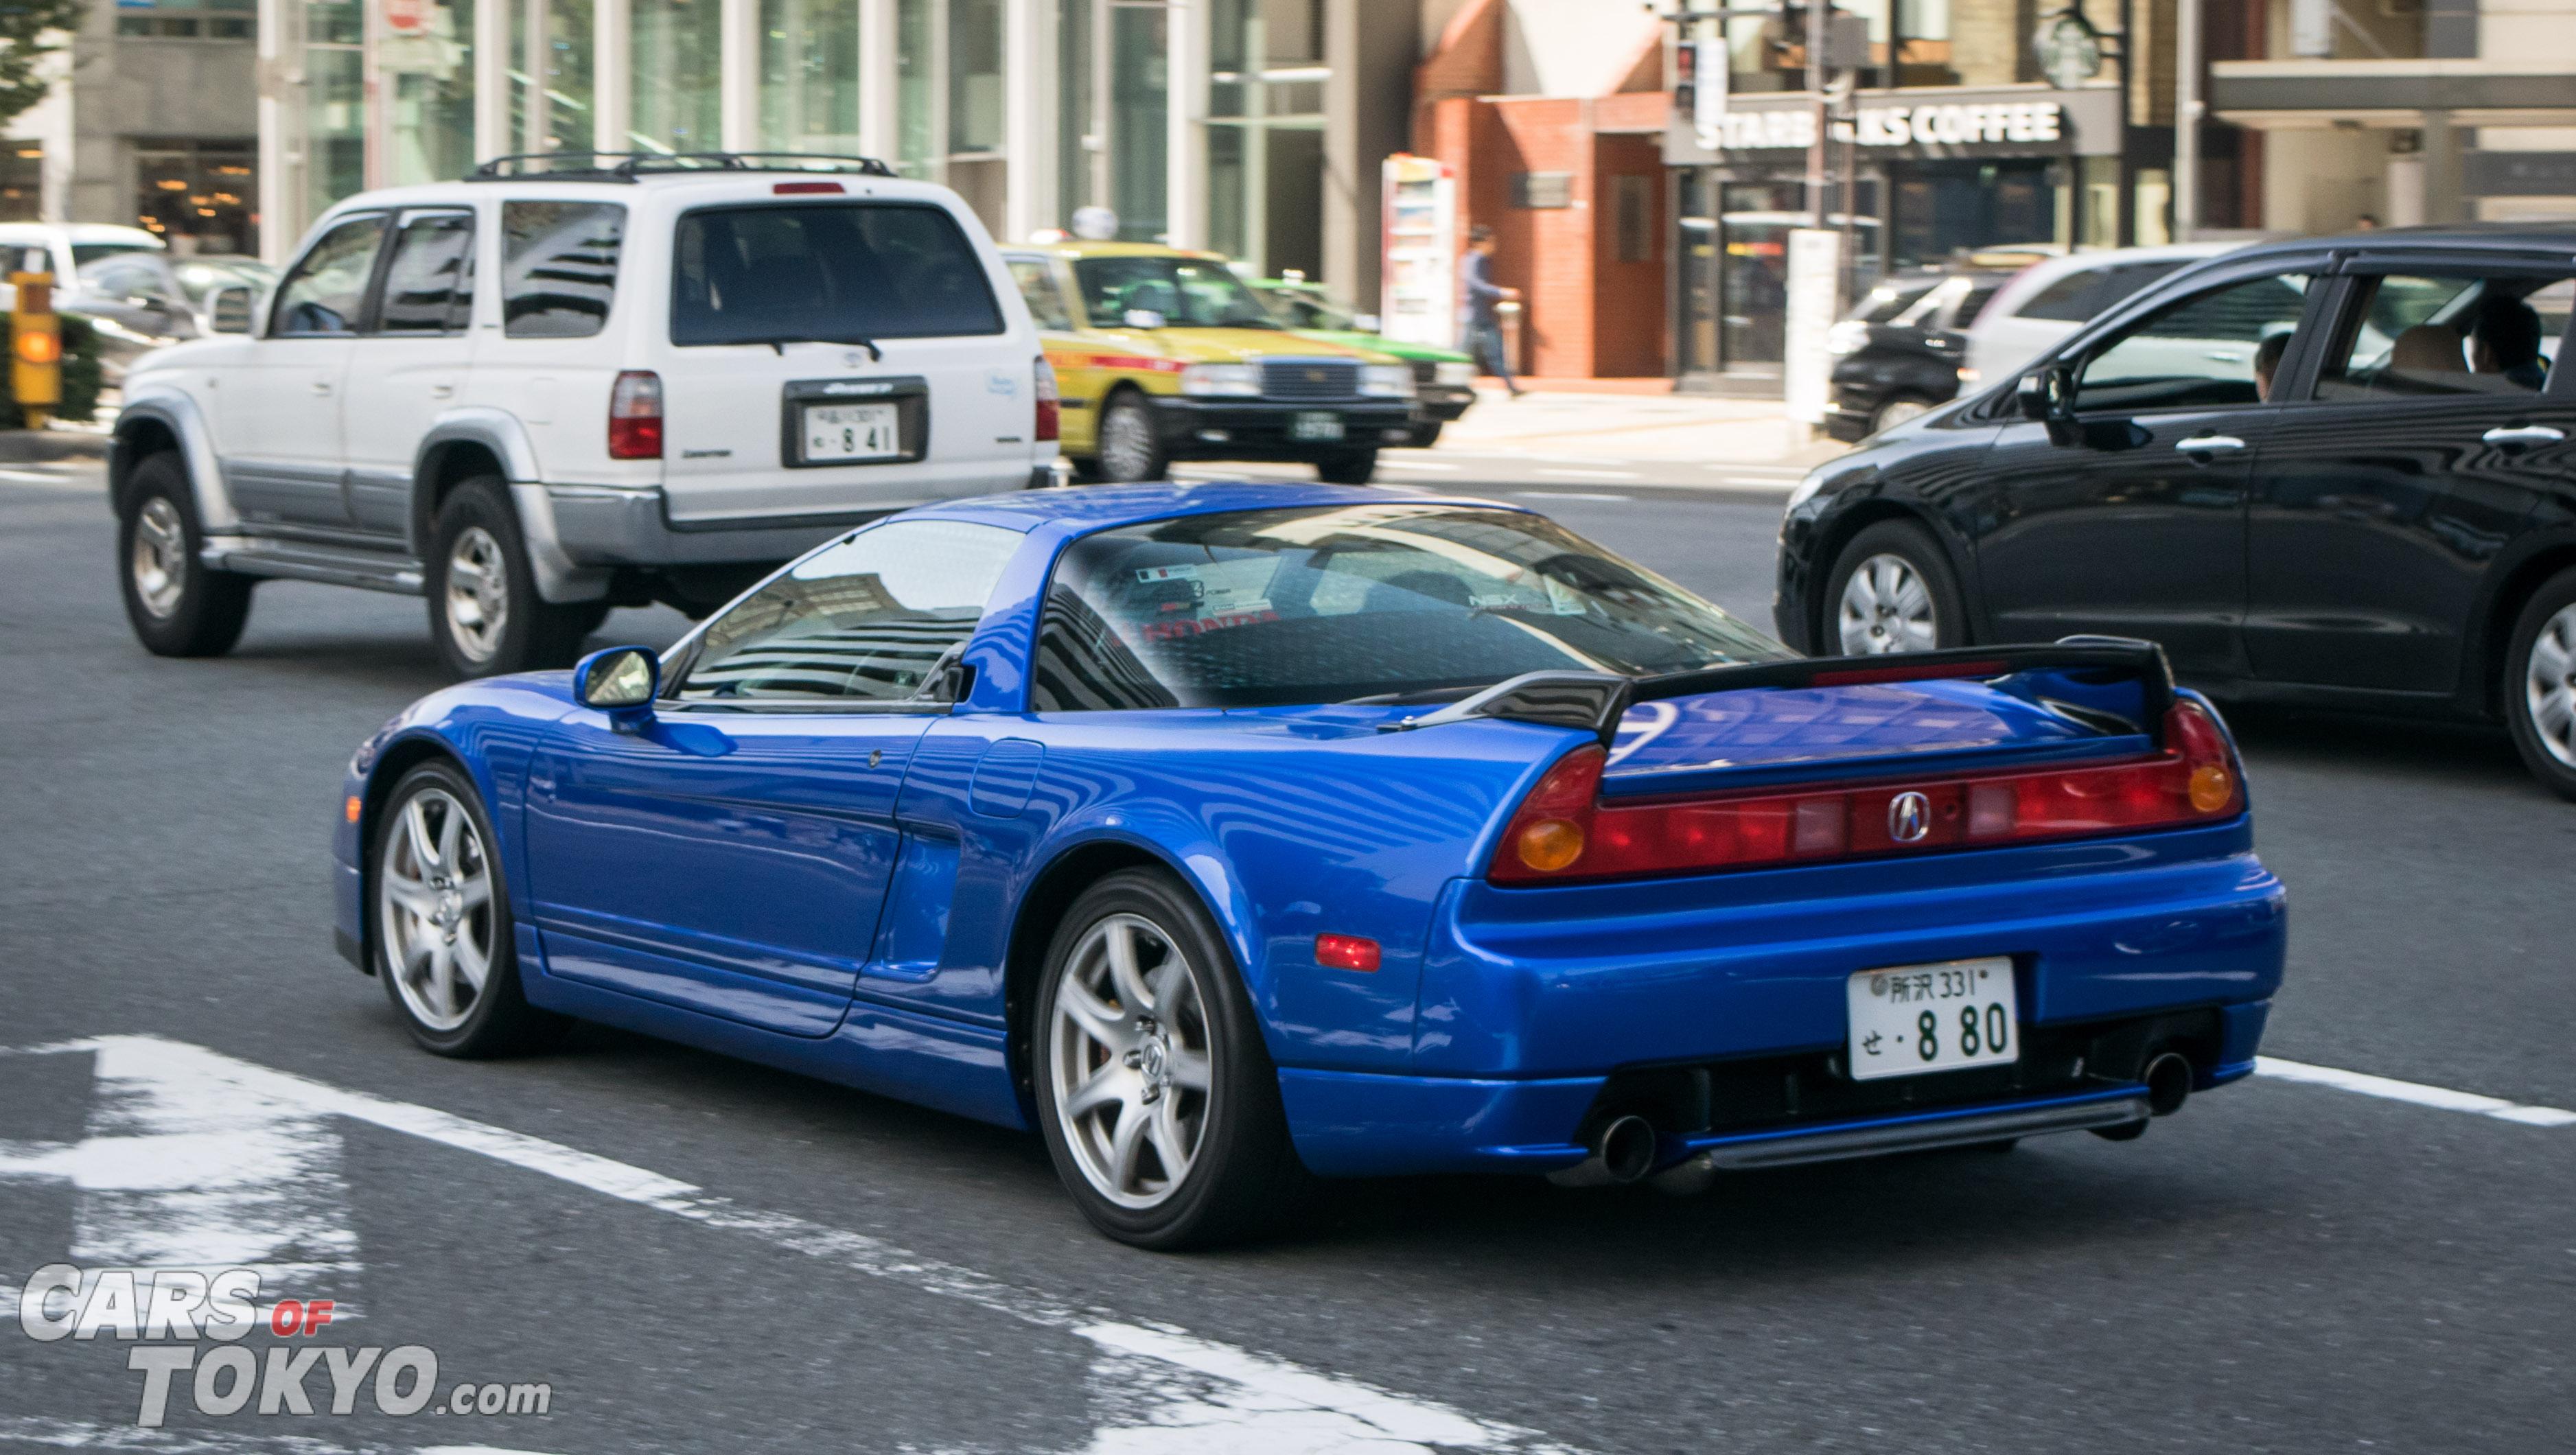 Cars of Tokyo NSX Acura NA2